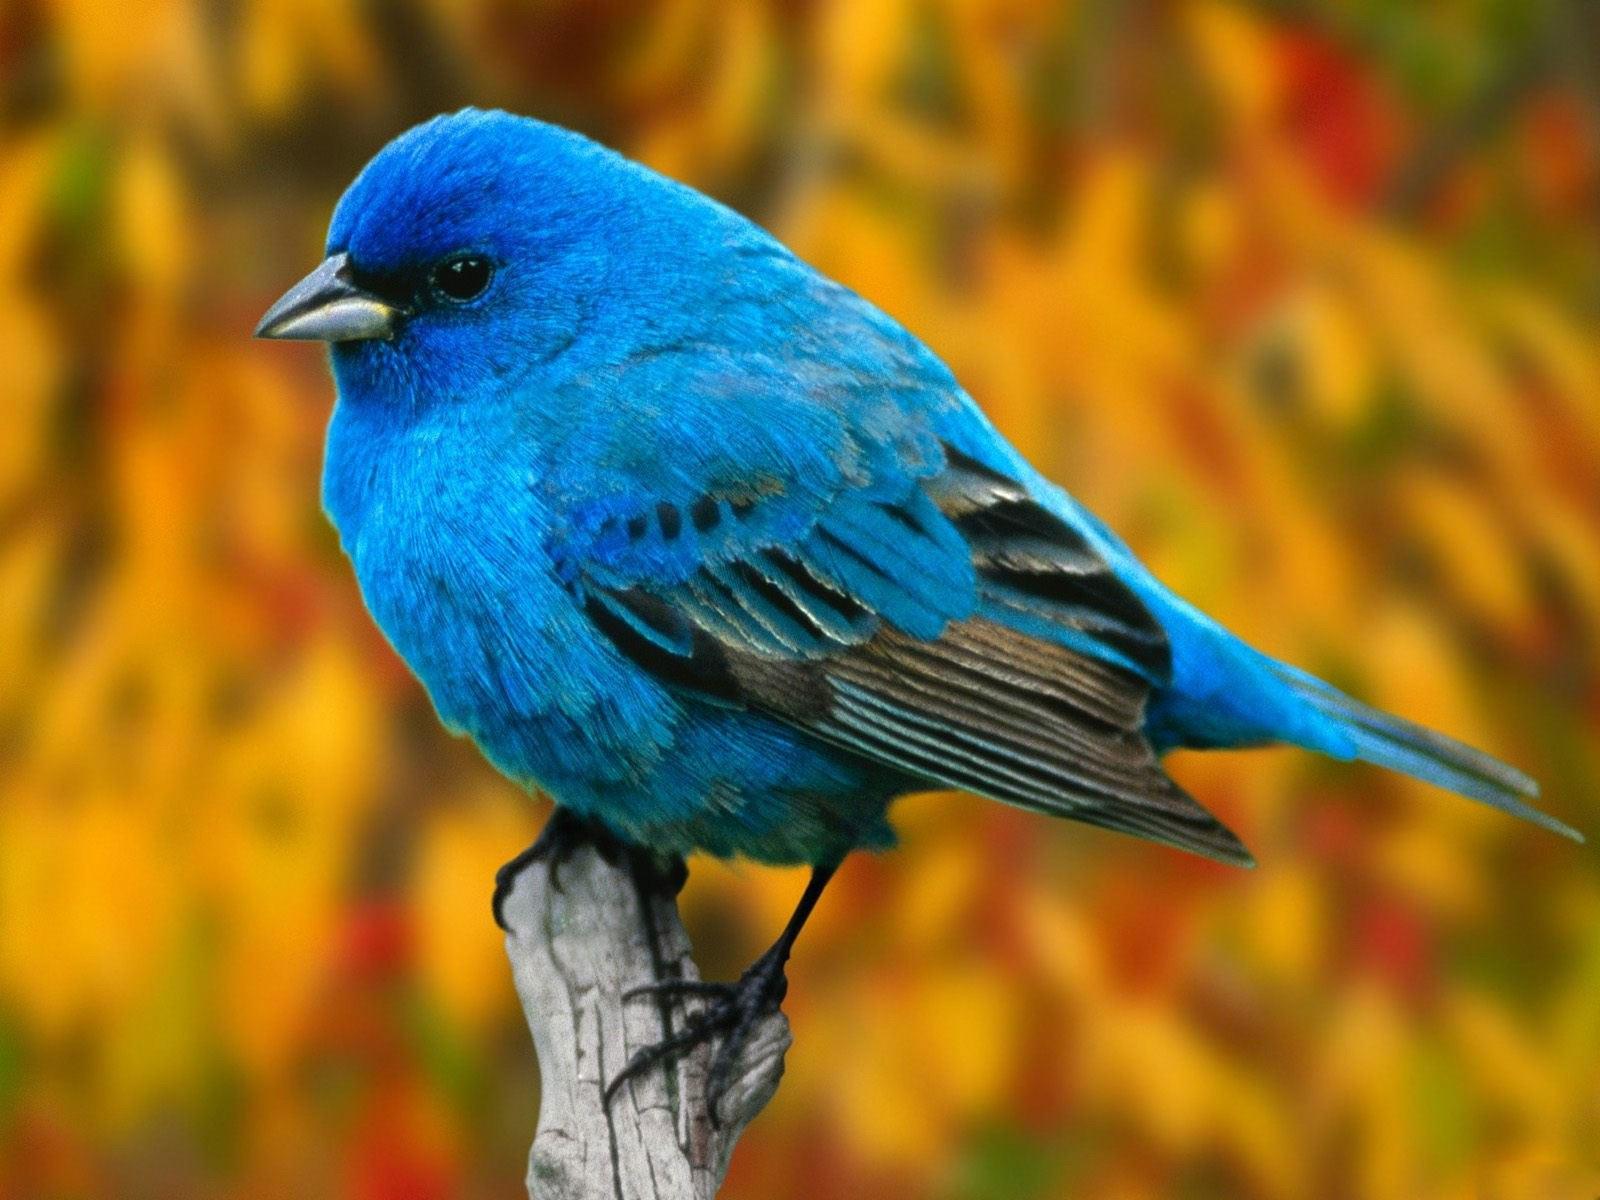 http://4.bp.blogspot.com/-Q-dDVIAvbPY/T1crxe2DU-I/AAAAAAAAGr8/pPk6-fpKvto/s1600/blue-bird-wallpaper-free.jpg